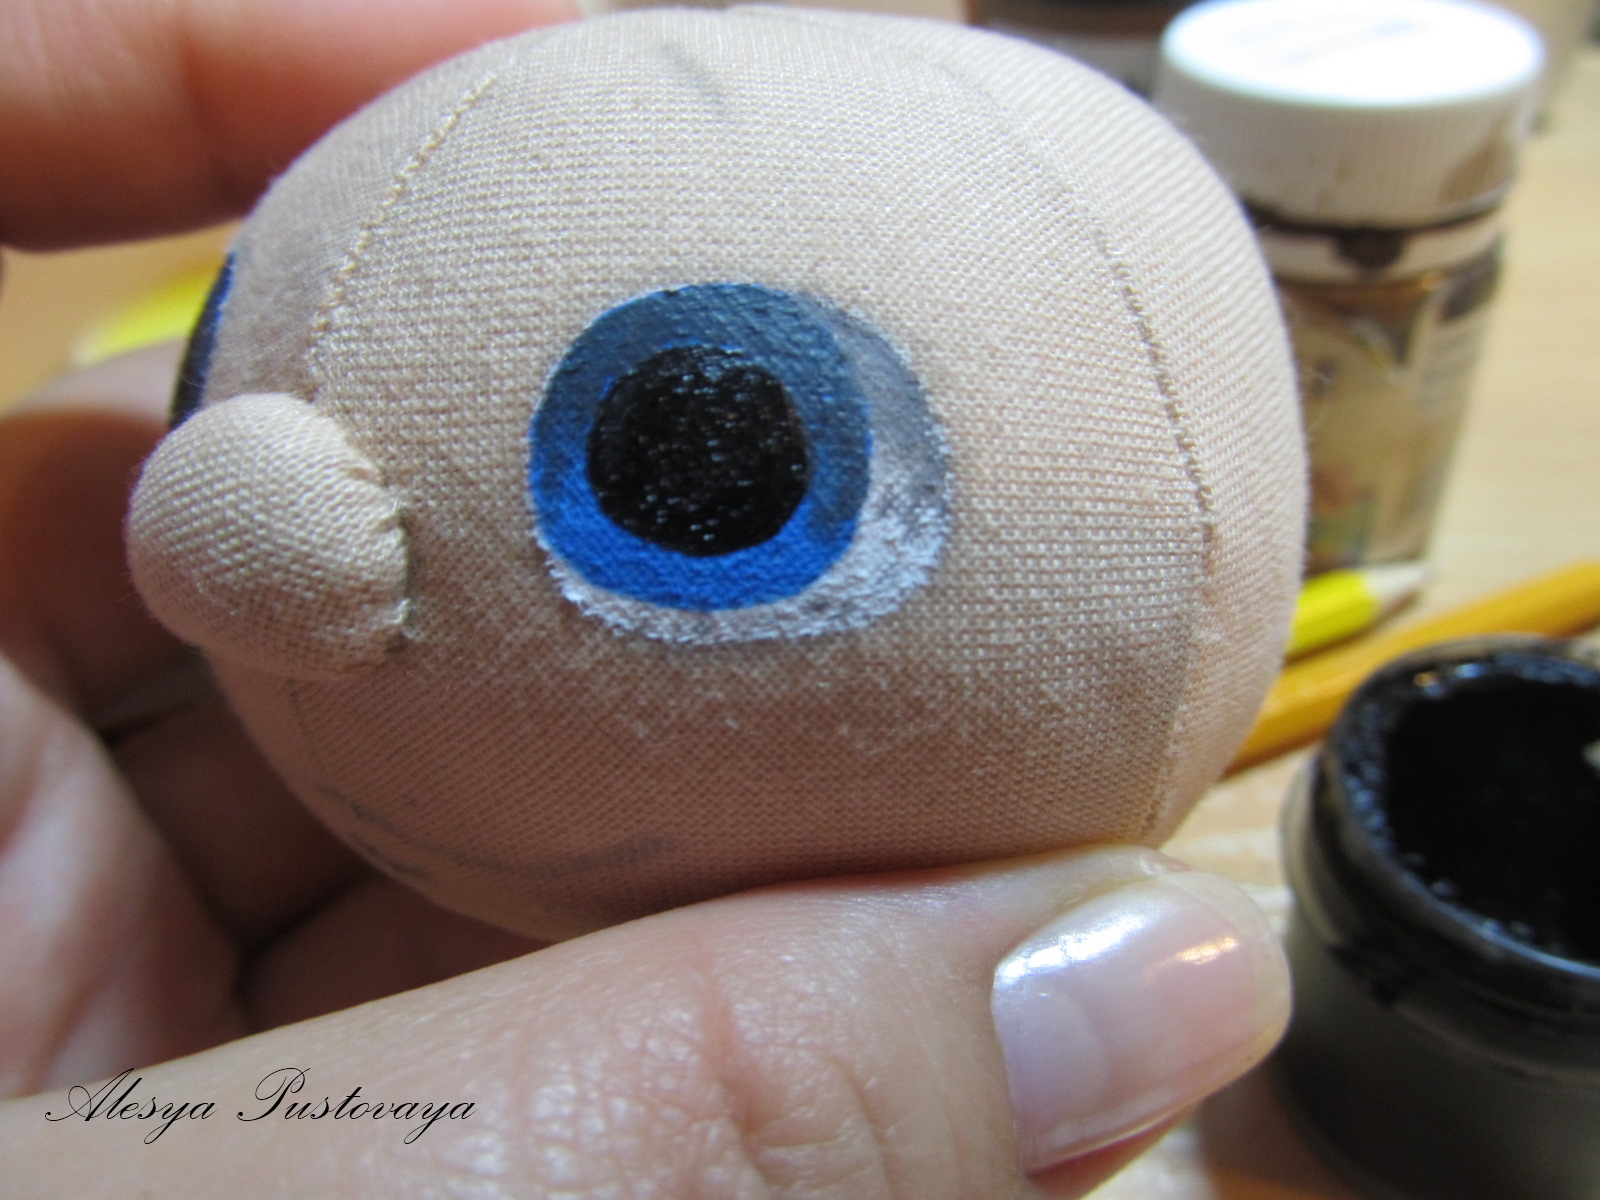 Глаза у игрушки мягкой своими руками